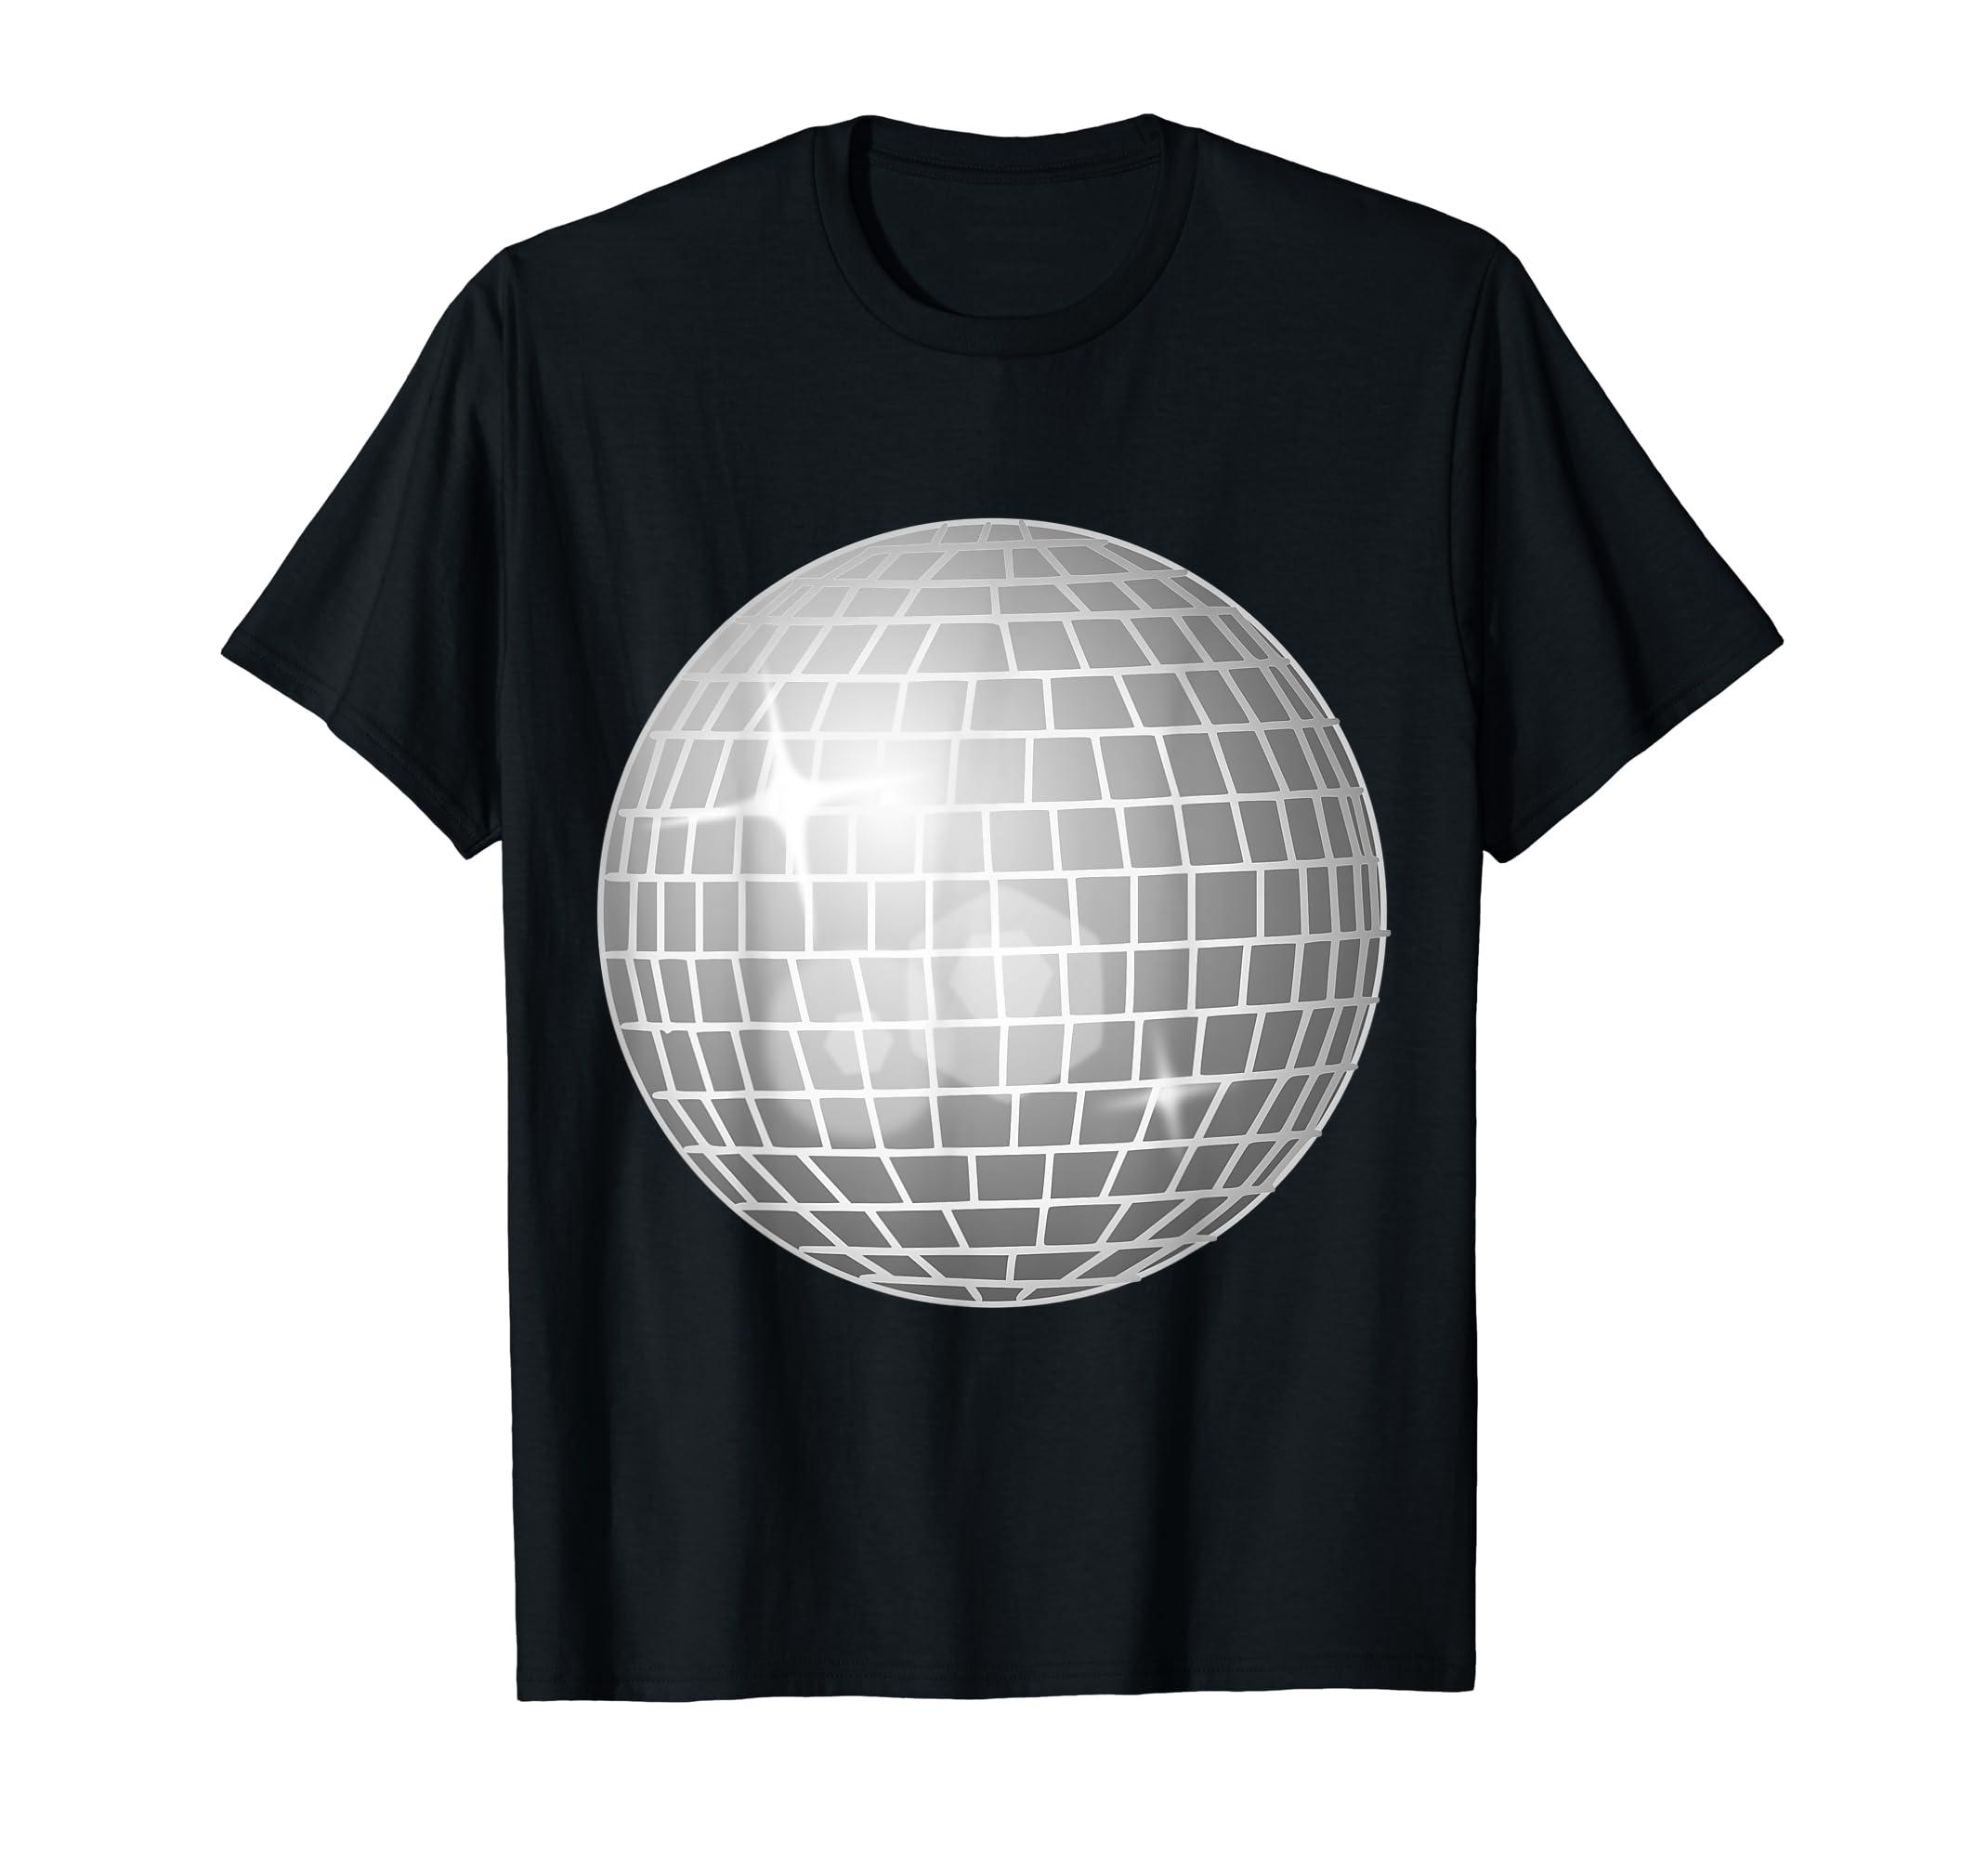 dbdd64a80 Amazon.com: I Love Disco T-Shirt with Silver Cool Mirror Ball Tee Shirt:  Clothing